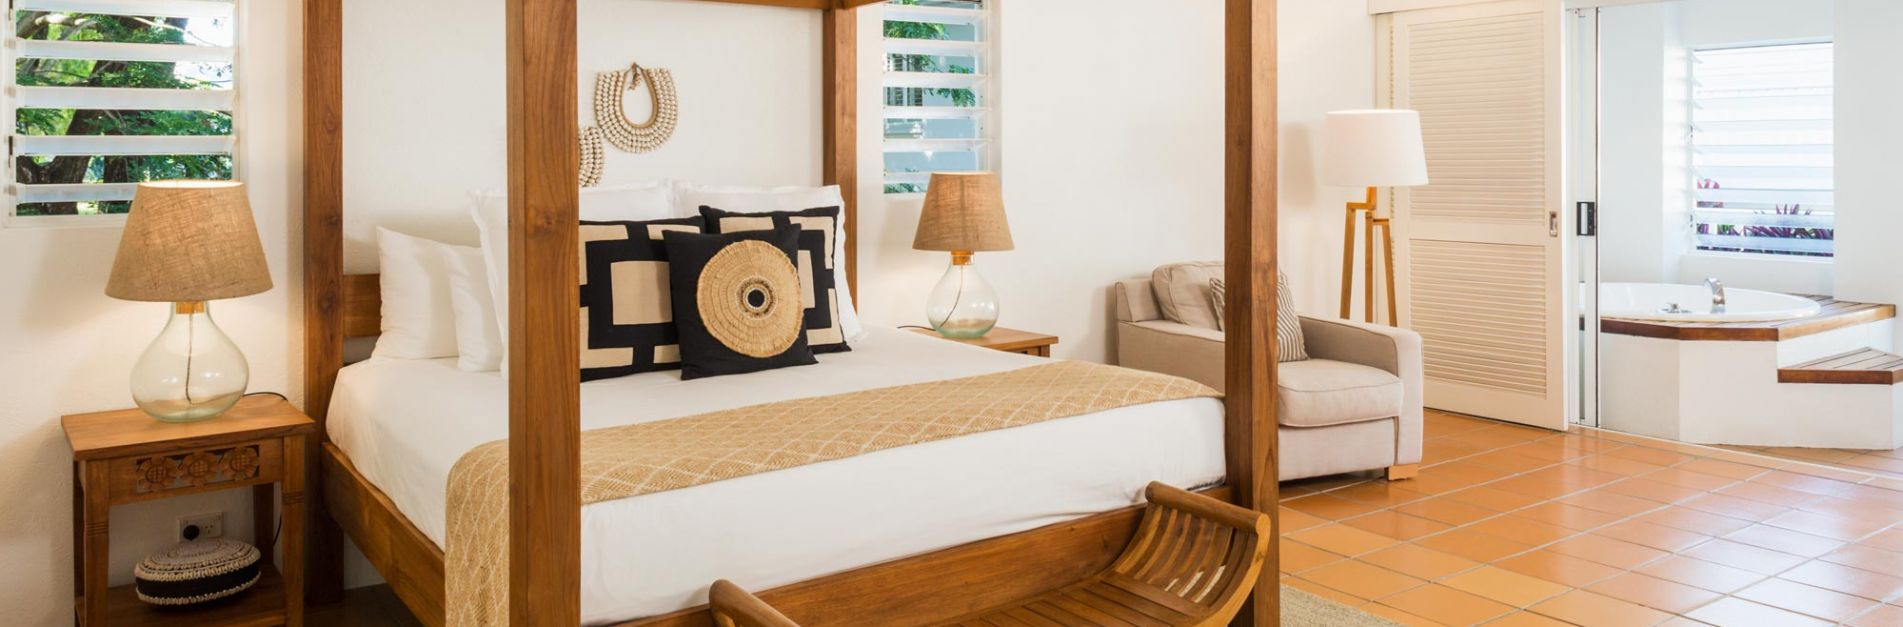 80-29062018181826-0-379-1999-658-1903x627-cropped-verandah-king-spa-suite-bed